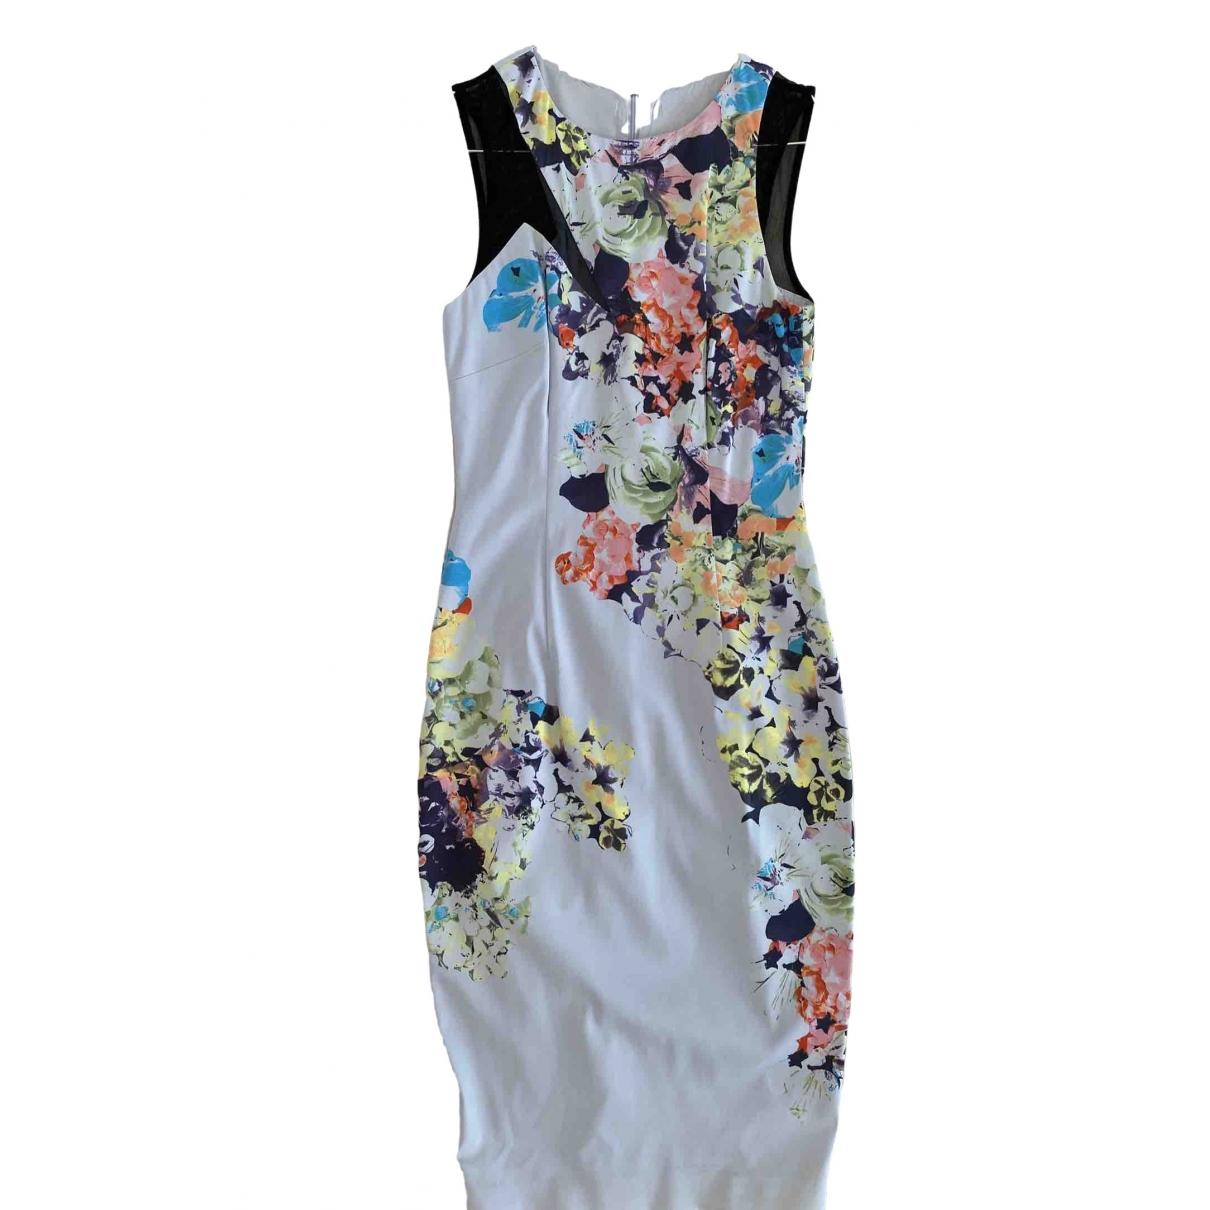 Karen Millen \N Kleid in  Blau Polyester